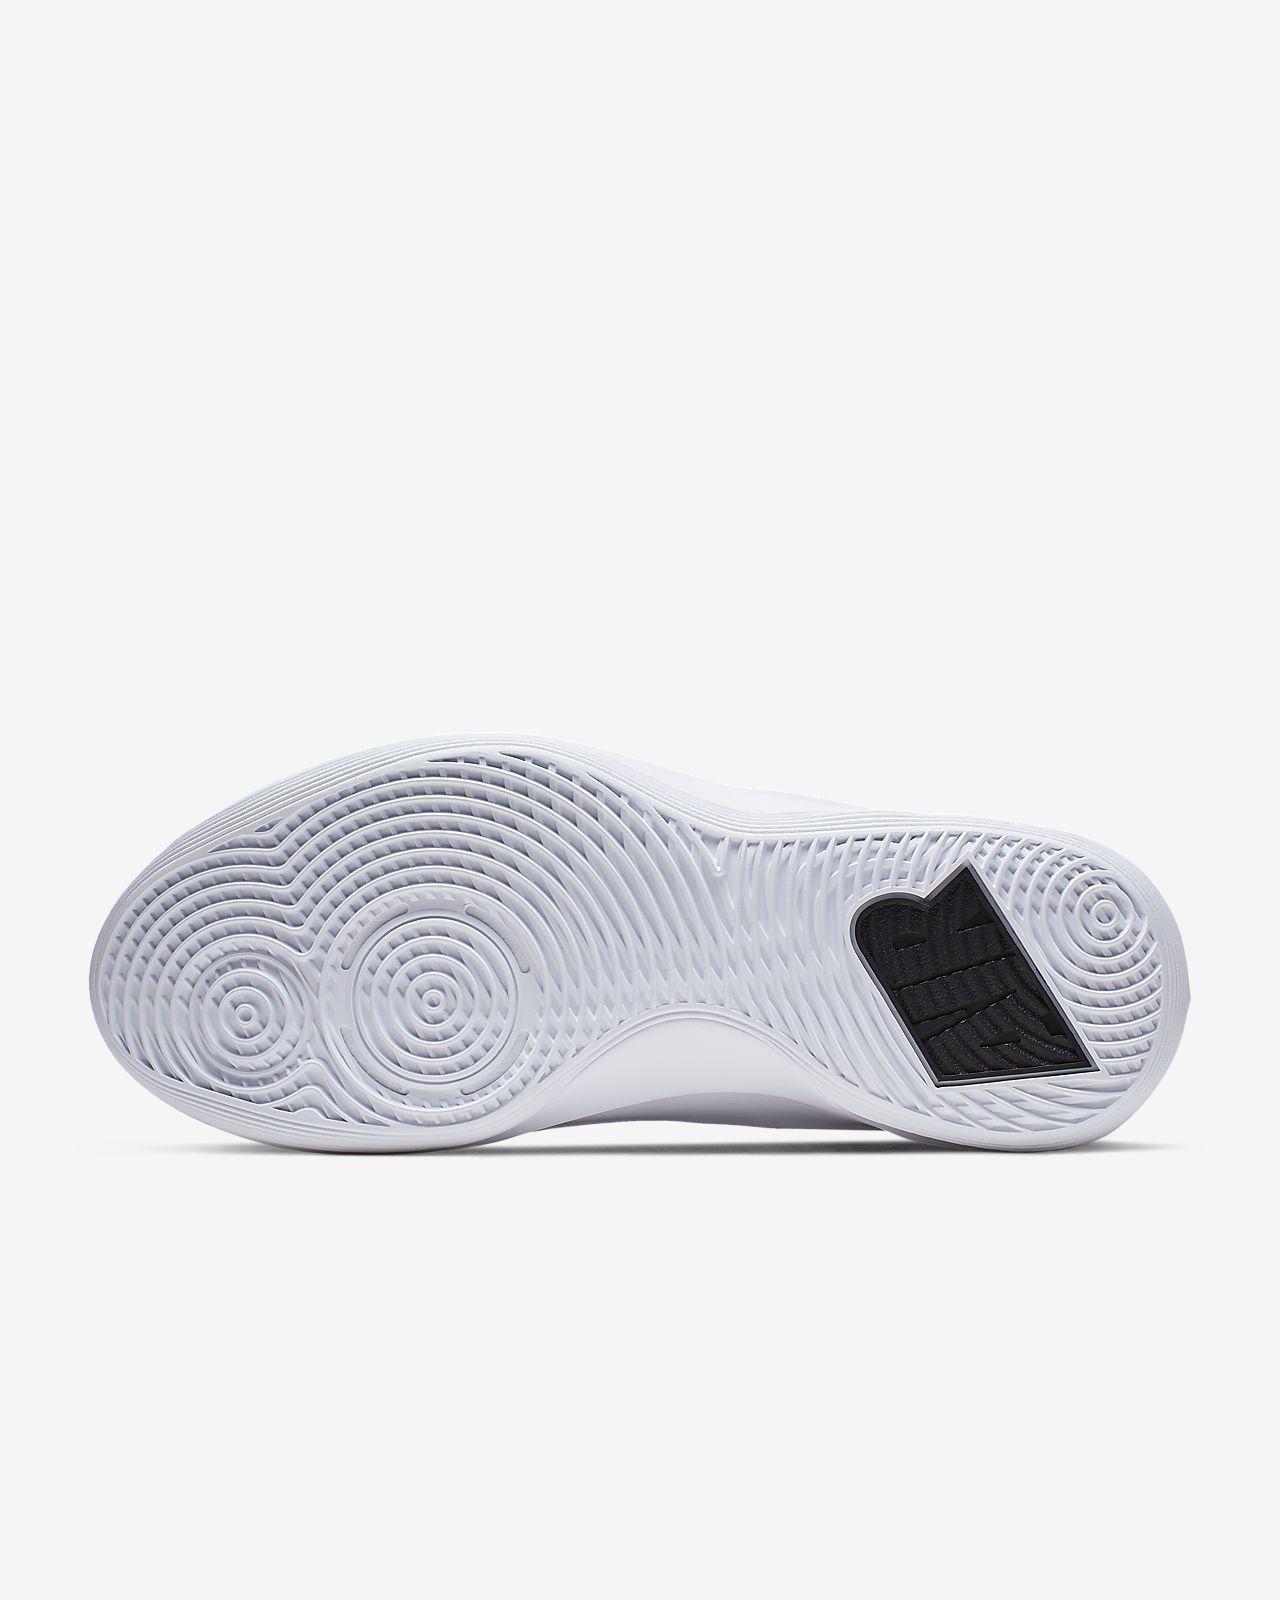 outlet store 097cb 1c87e ... Nike Air Versitile III Basketball Shoe